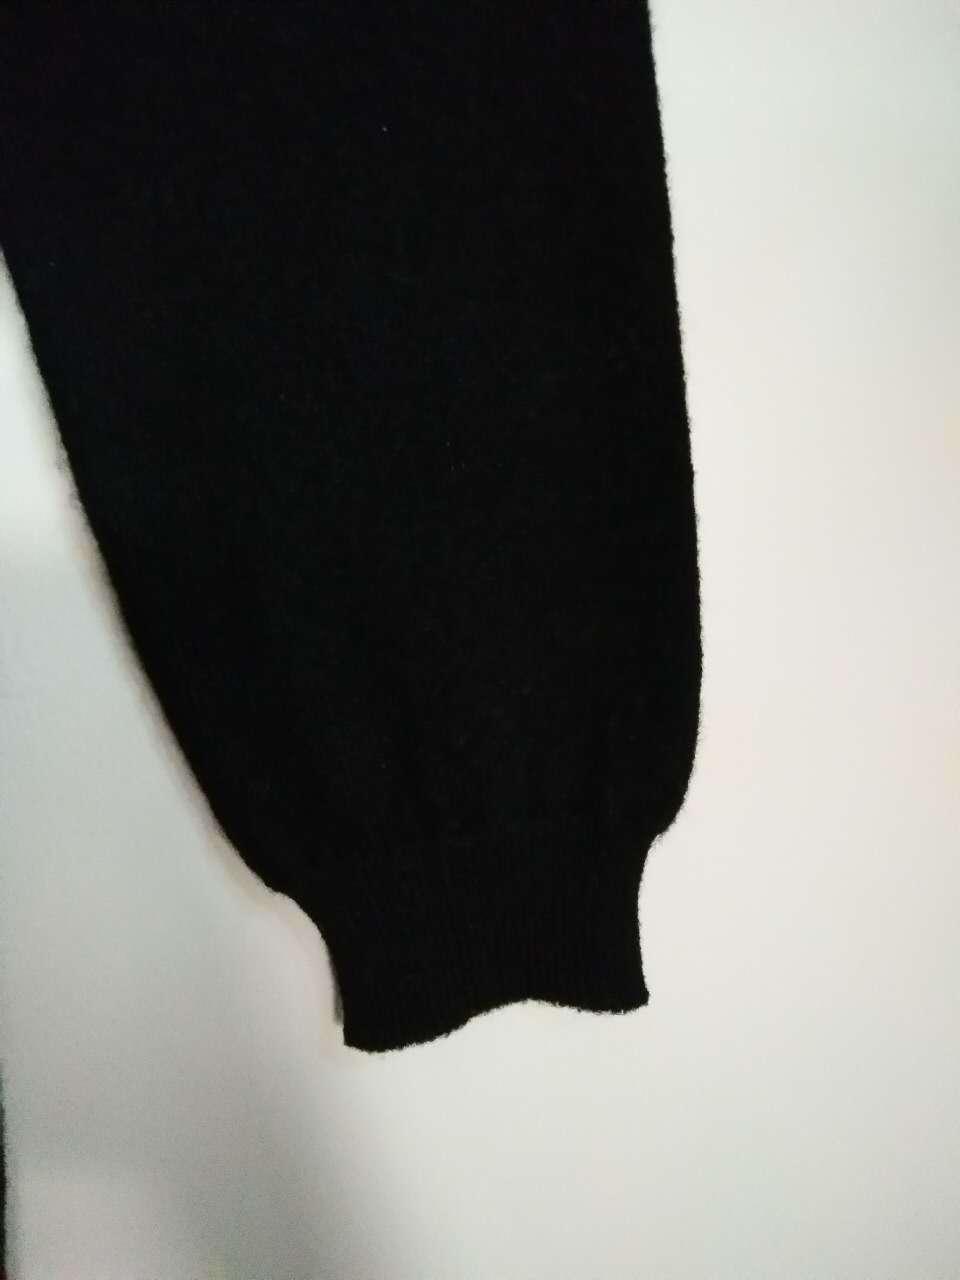 Trj016, 100%Cashmere, Black, Women&Lady, Good Quality, Sweater